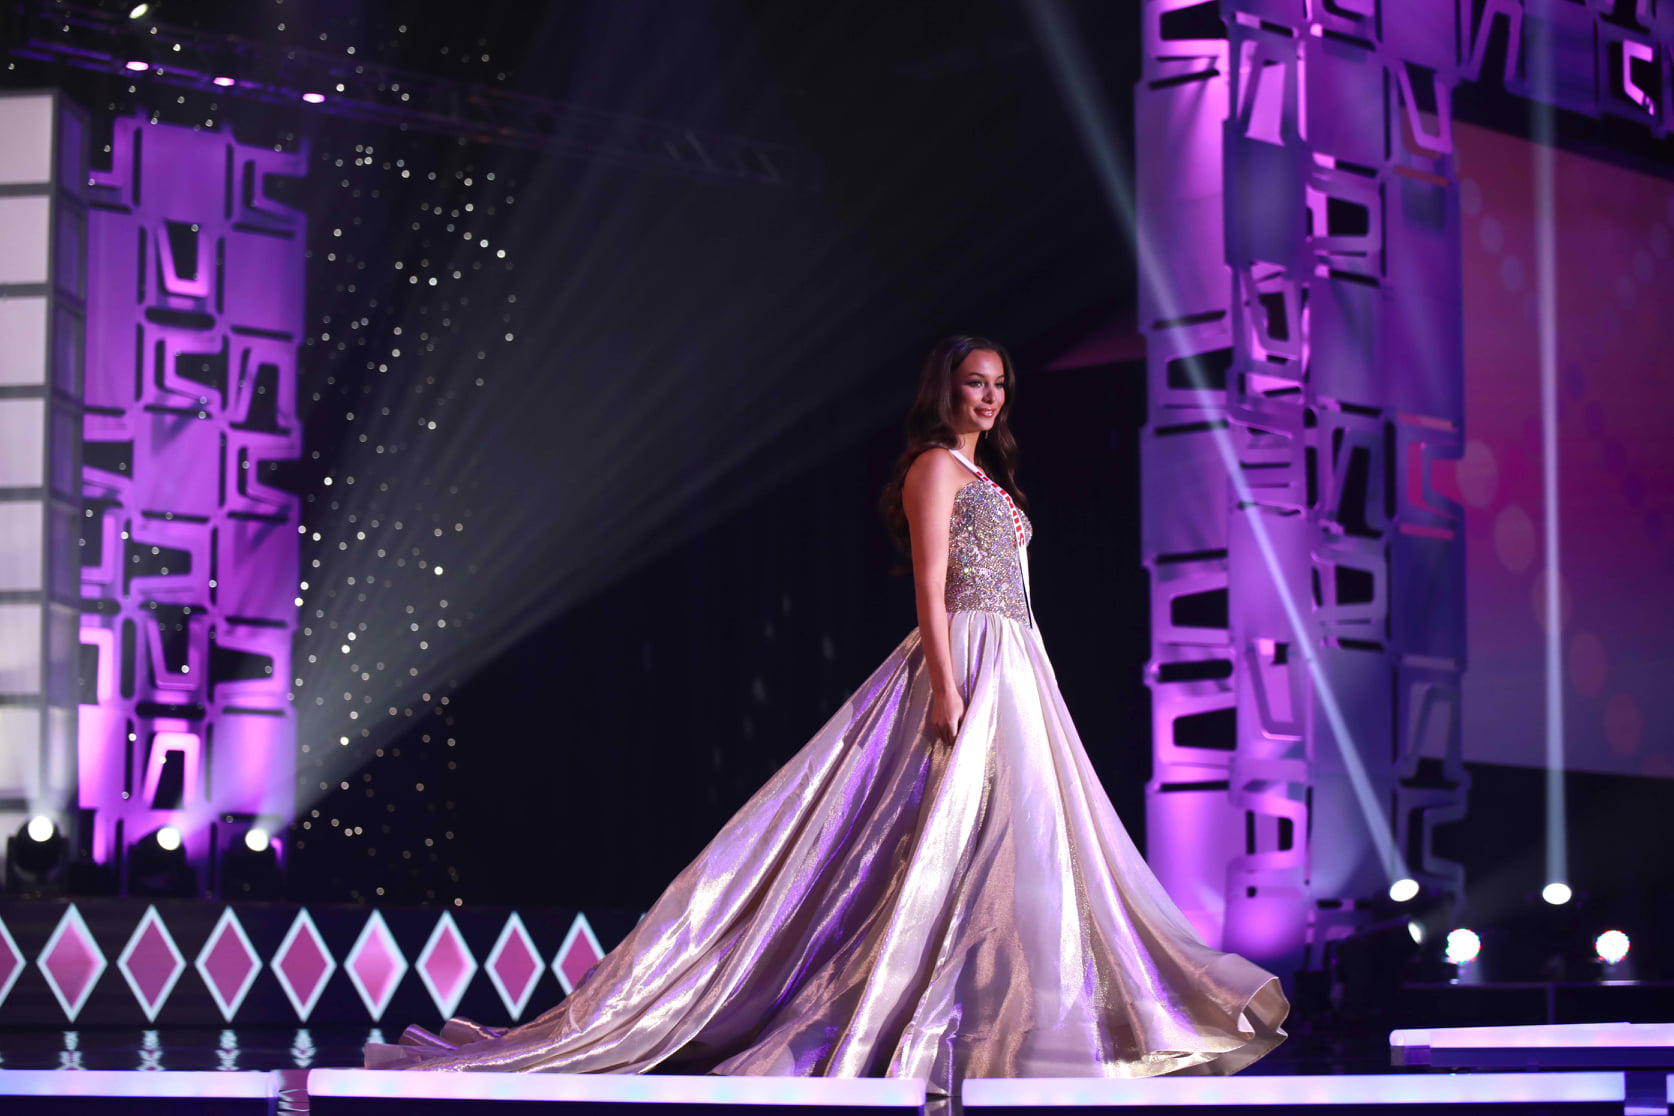 candidatas a miss teen usa 2020. final: 7 nov. preliminary competition a partir pag. 21. - Página 26 2b4jb4iv